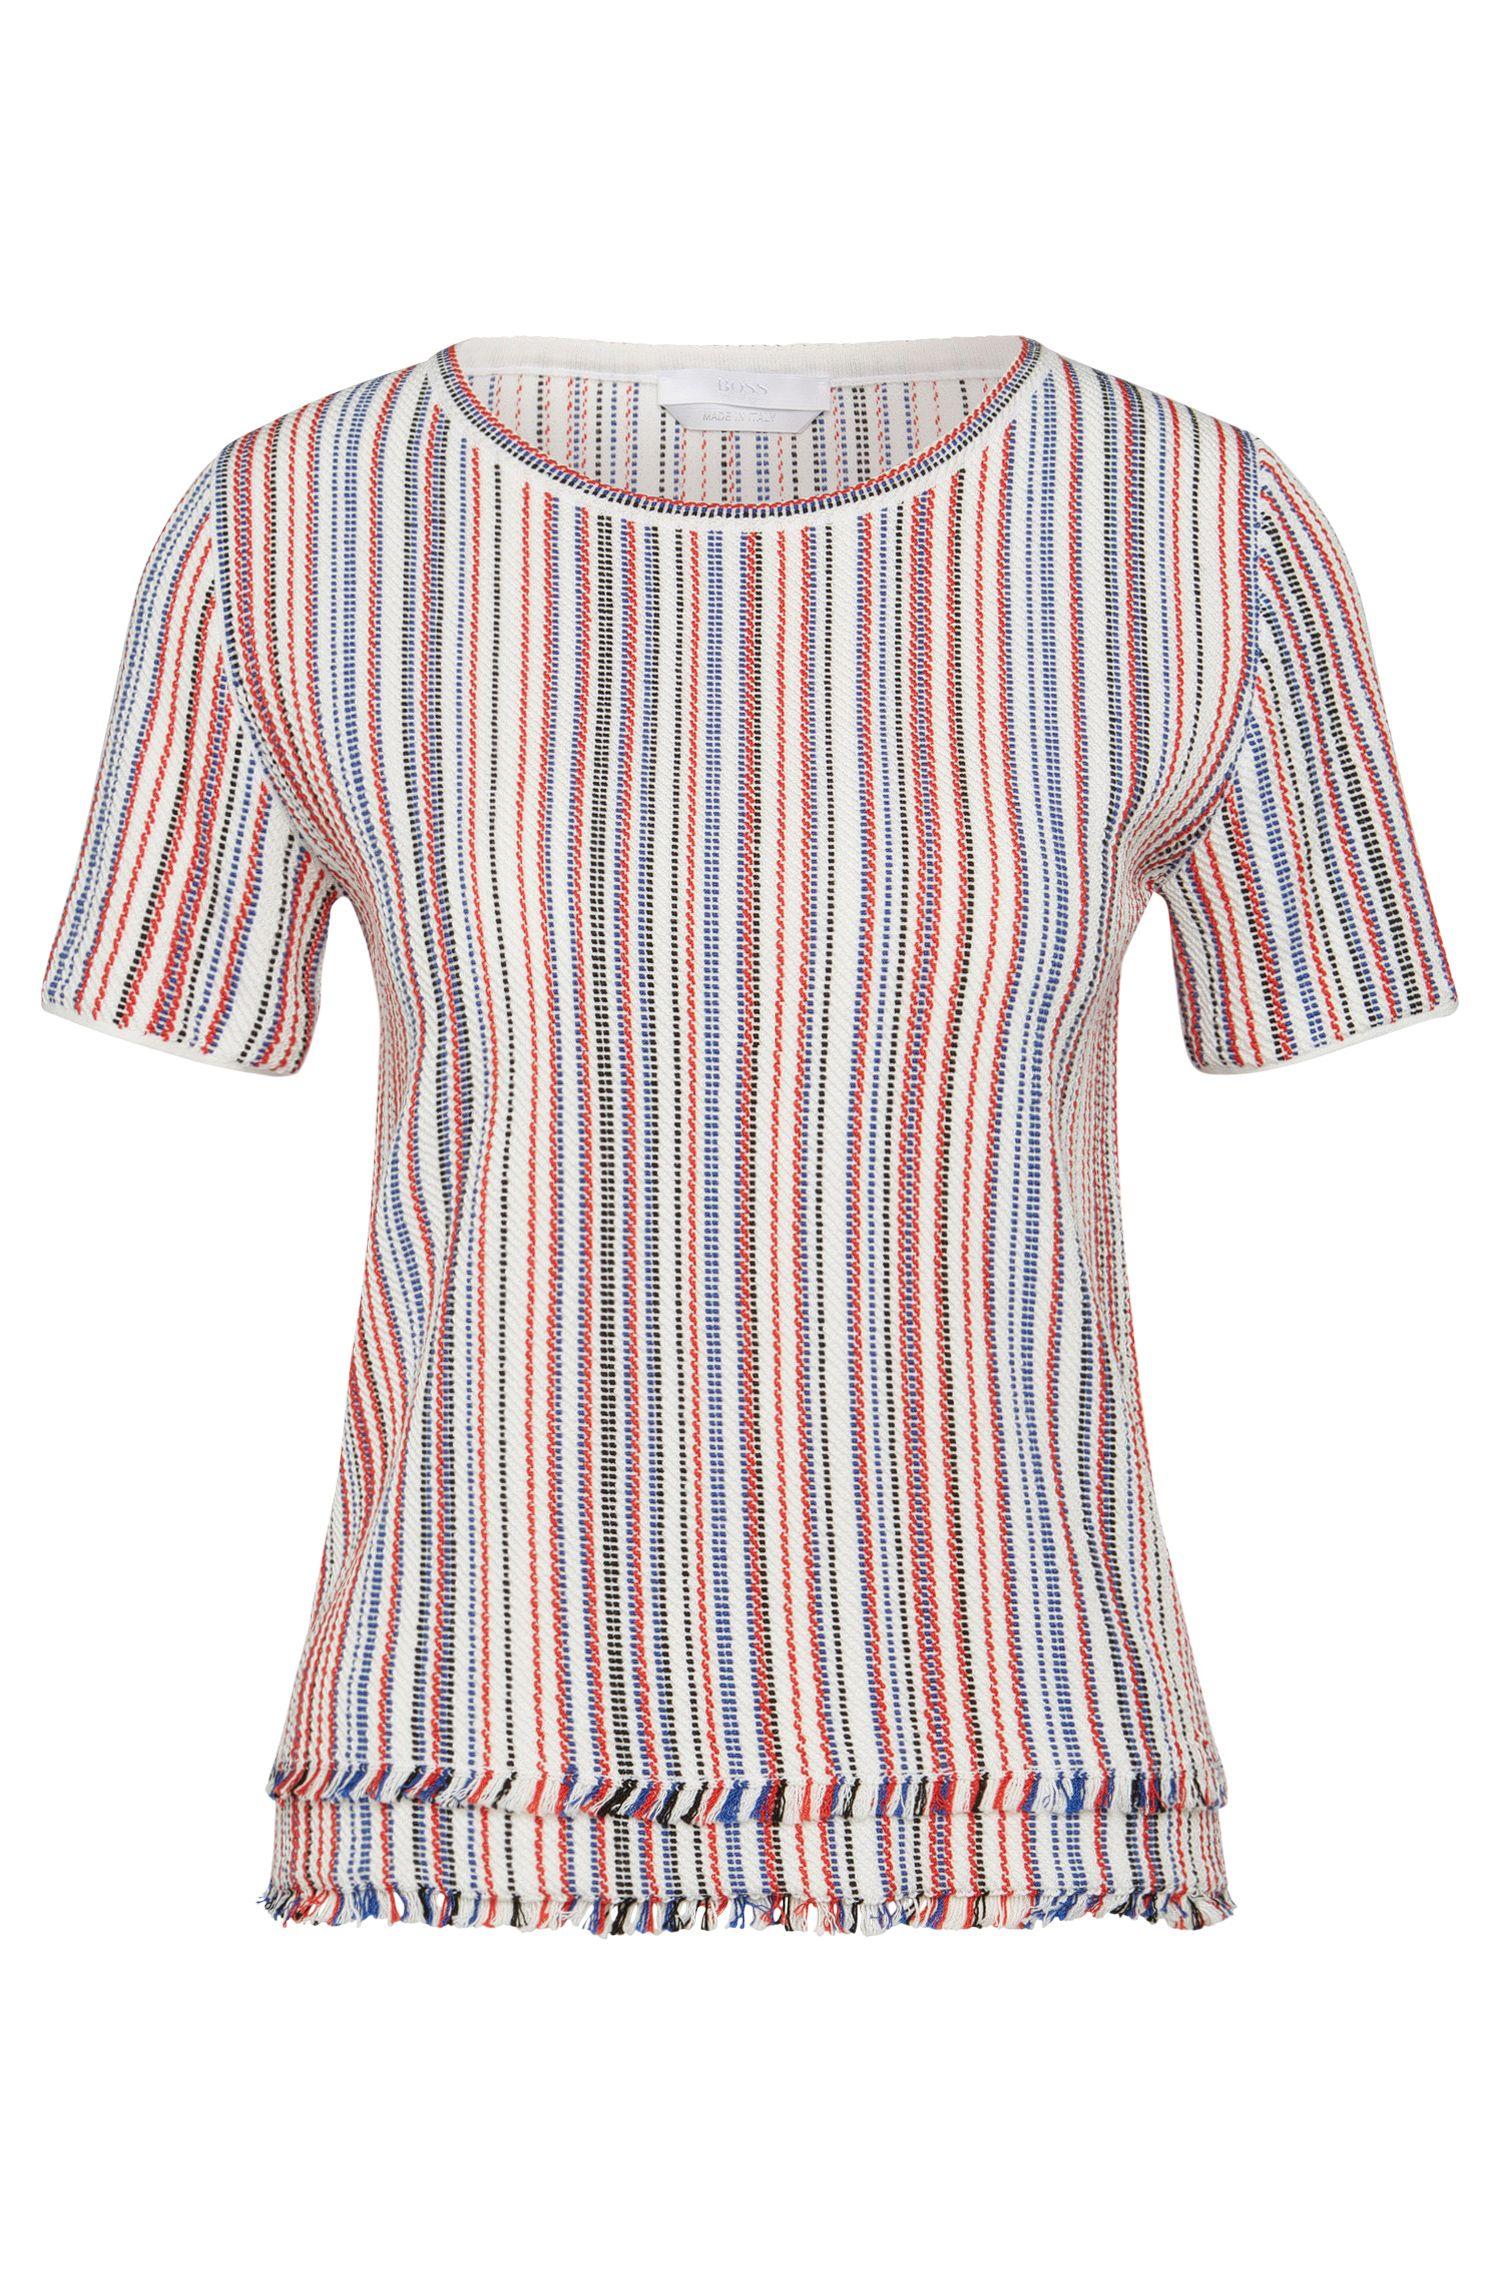 'Fina' | Cotton Blend Multi-Stripe Fringed Blouse